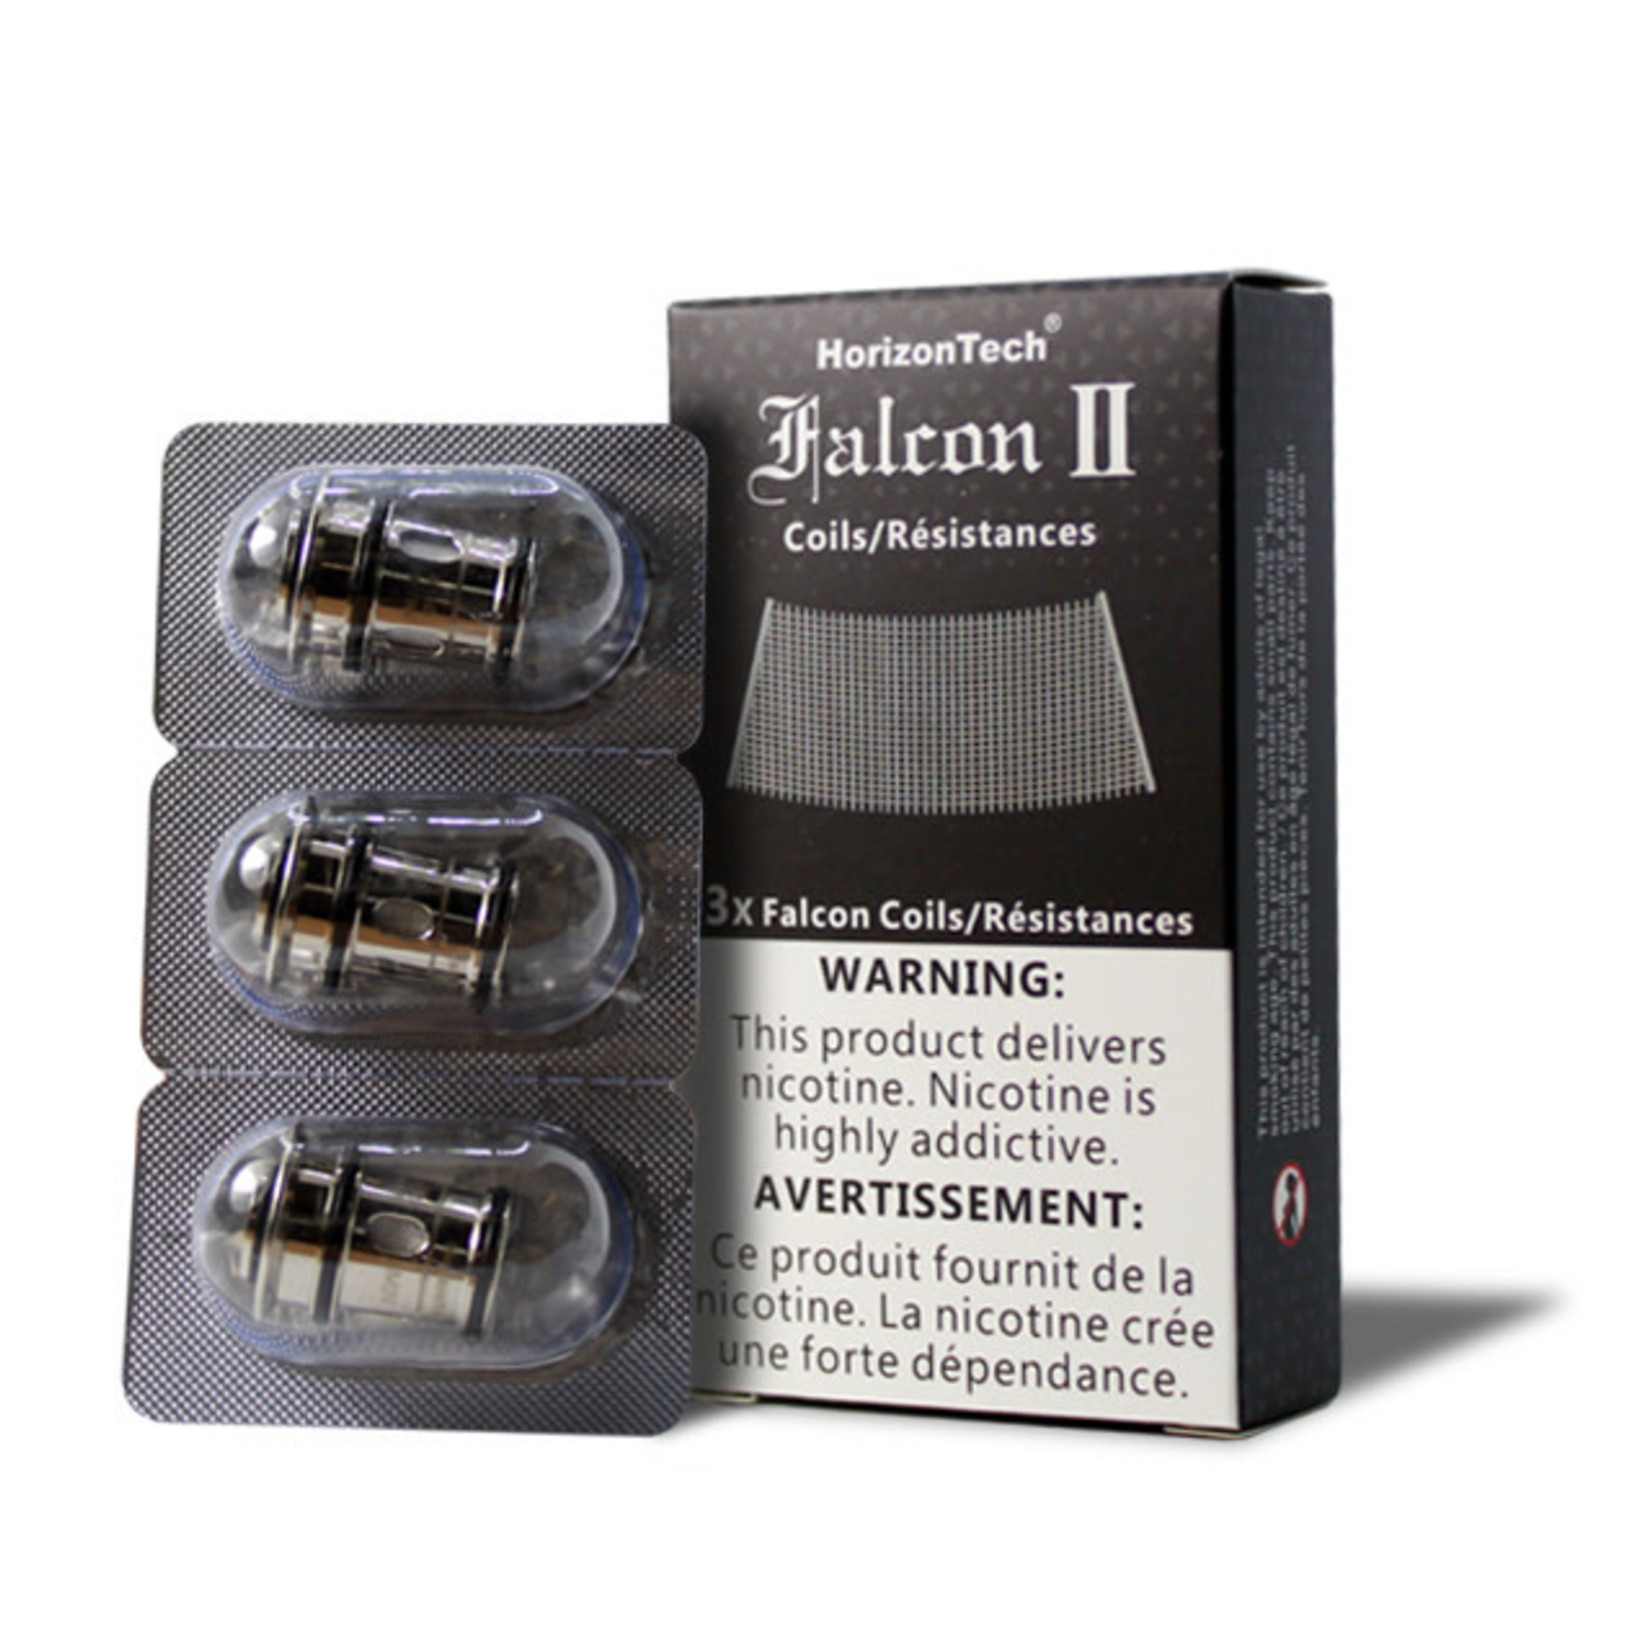 Horizontech Falcon 2 Replacement Coils Sector Mesh 0.14 ohm Pack (3 pcs)